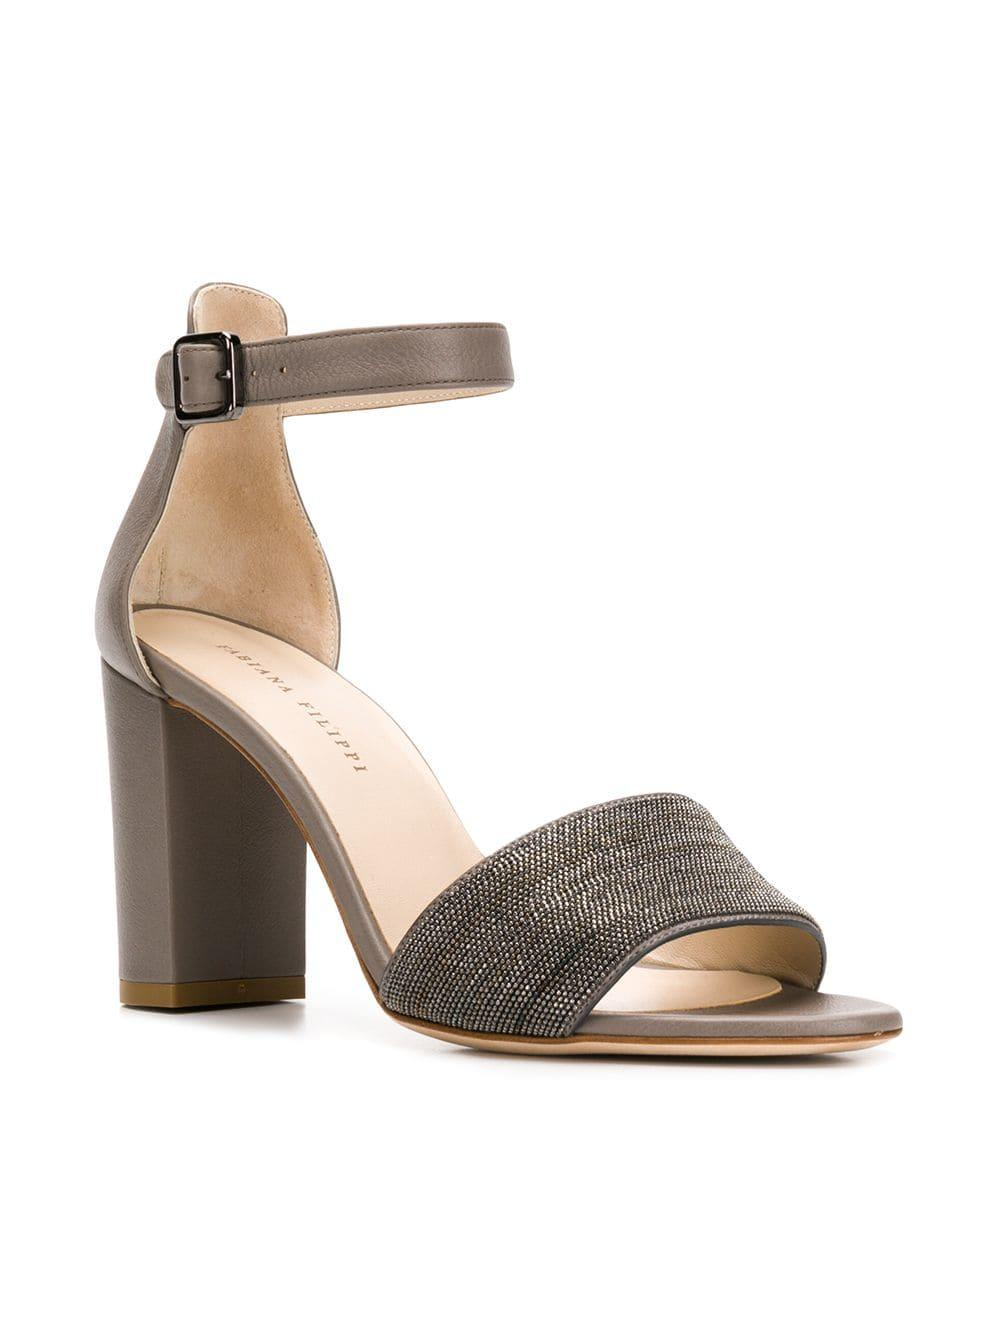 5ee6e0d82446 Lyst - Fabiana Filippi Embellished Block Heel Sandals in Gray